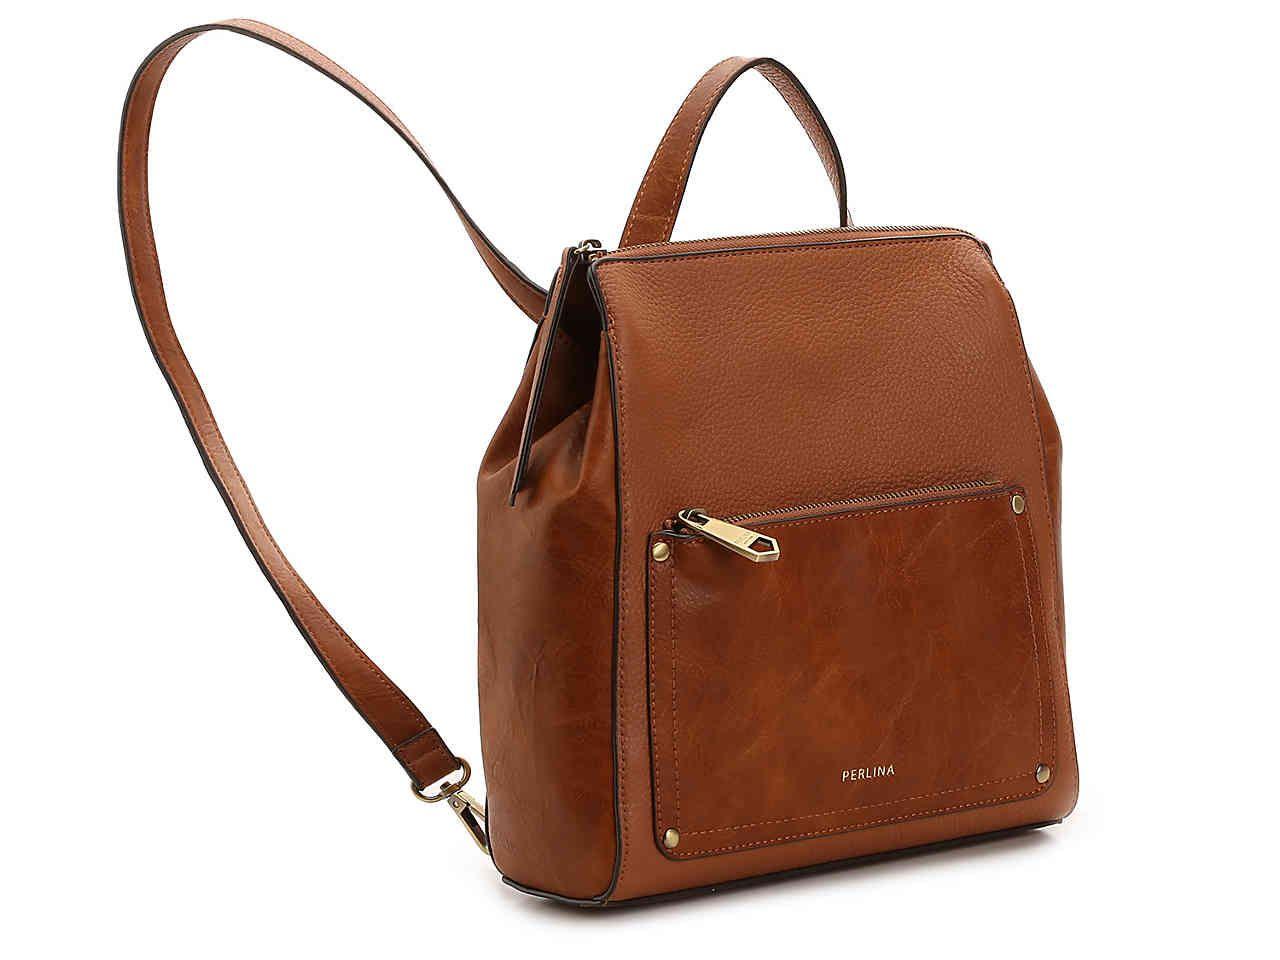 49fdb50f035 Perlina Judi Leather Convertible Backpack Women's Handbags ...